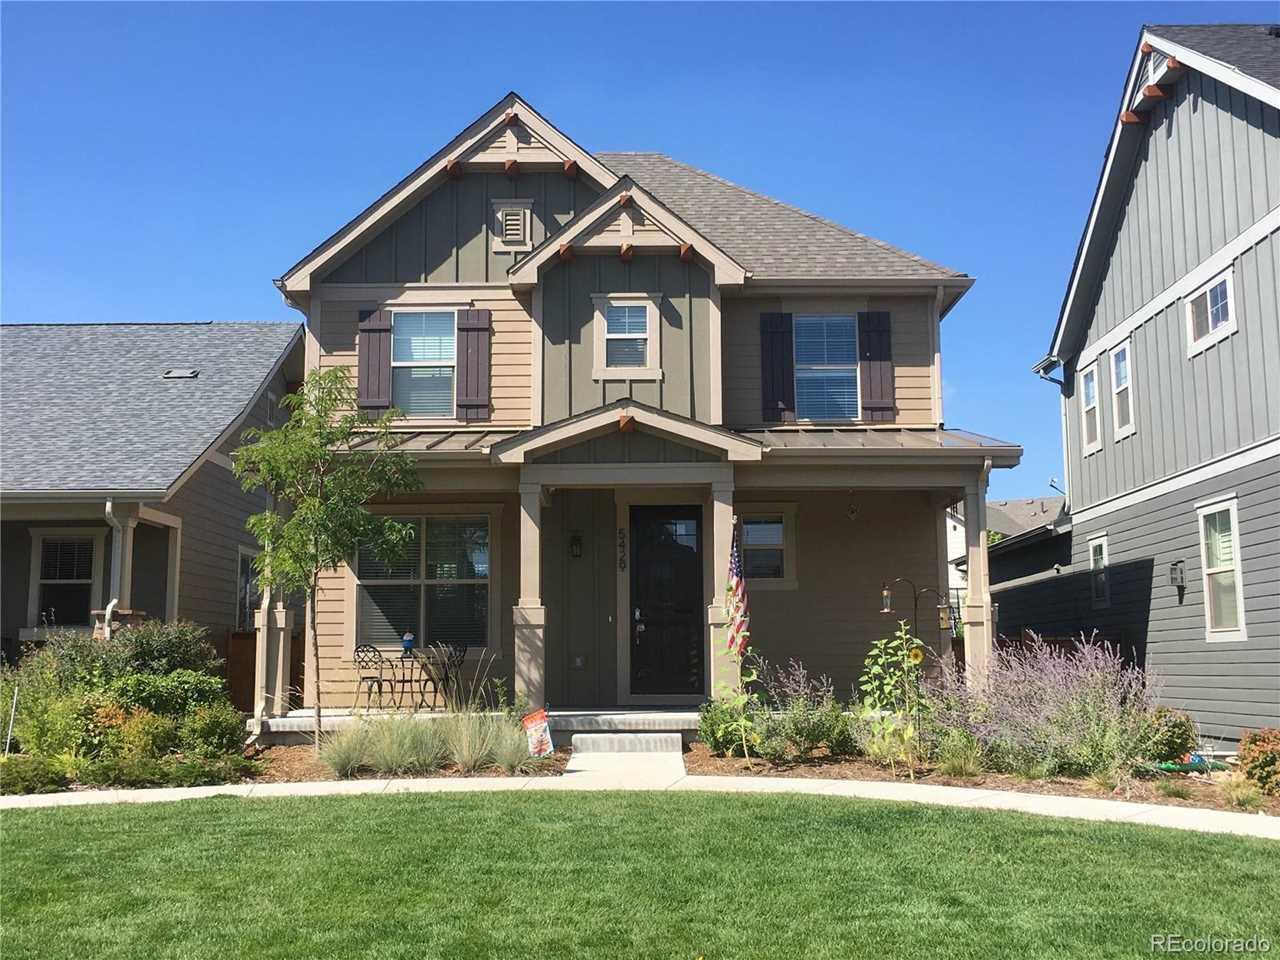 5429 Uinta Street Denver, CO 80238   MLS 6763396 Photo 1